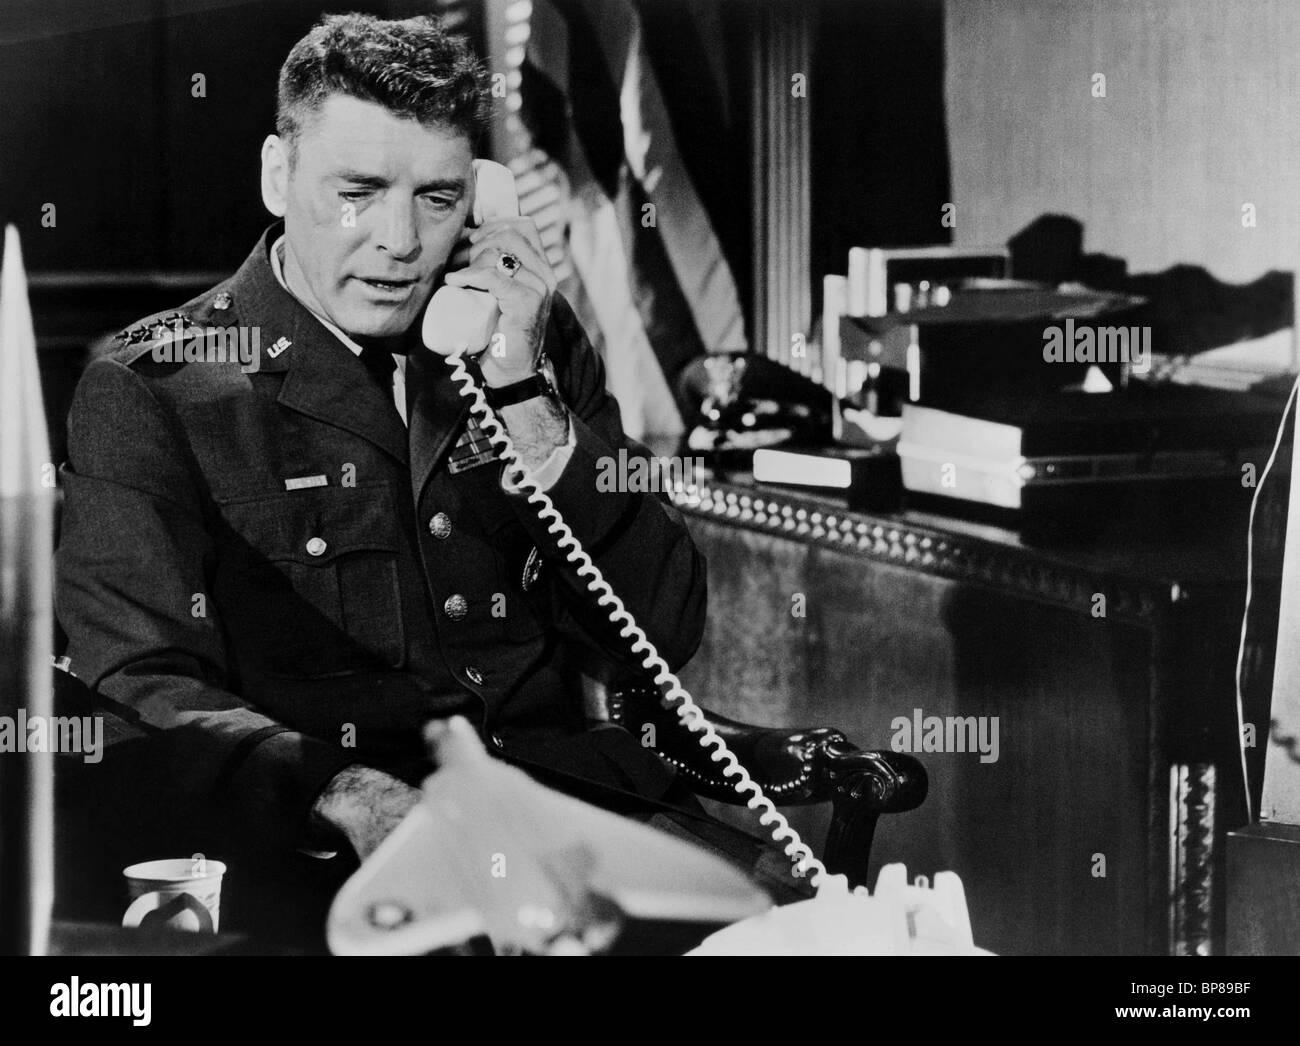 BURT LANCASTER SEVEN DAYS IN MAY (1964) - Stock Image